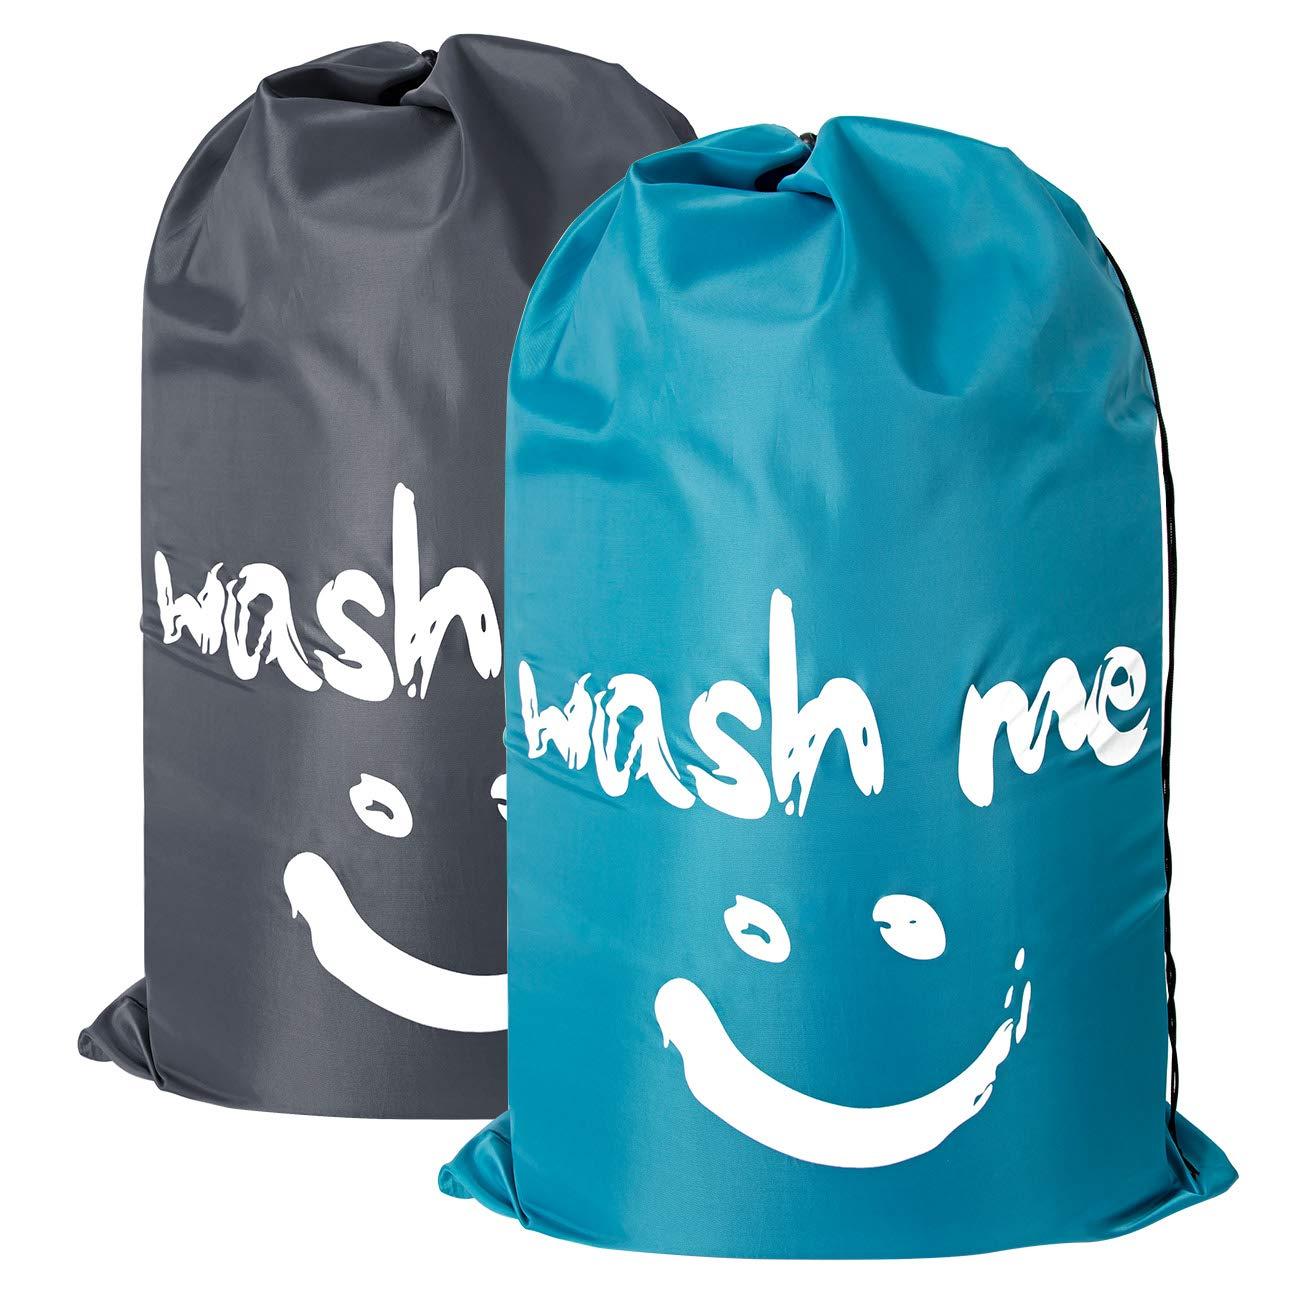 ZERO JET LAG 2 Pack Extra Large Travel Laundry Bag Set Nylon Rip-Stop Dirty Storage Bag Machine Washable Drawstring Closure 24'' x 36'' (Blue and Gray) by ZERO JET LAG (Image #1)